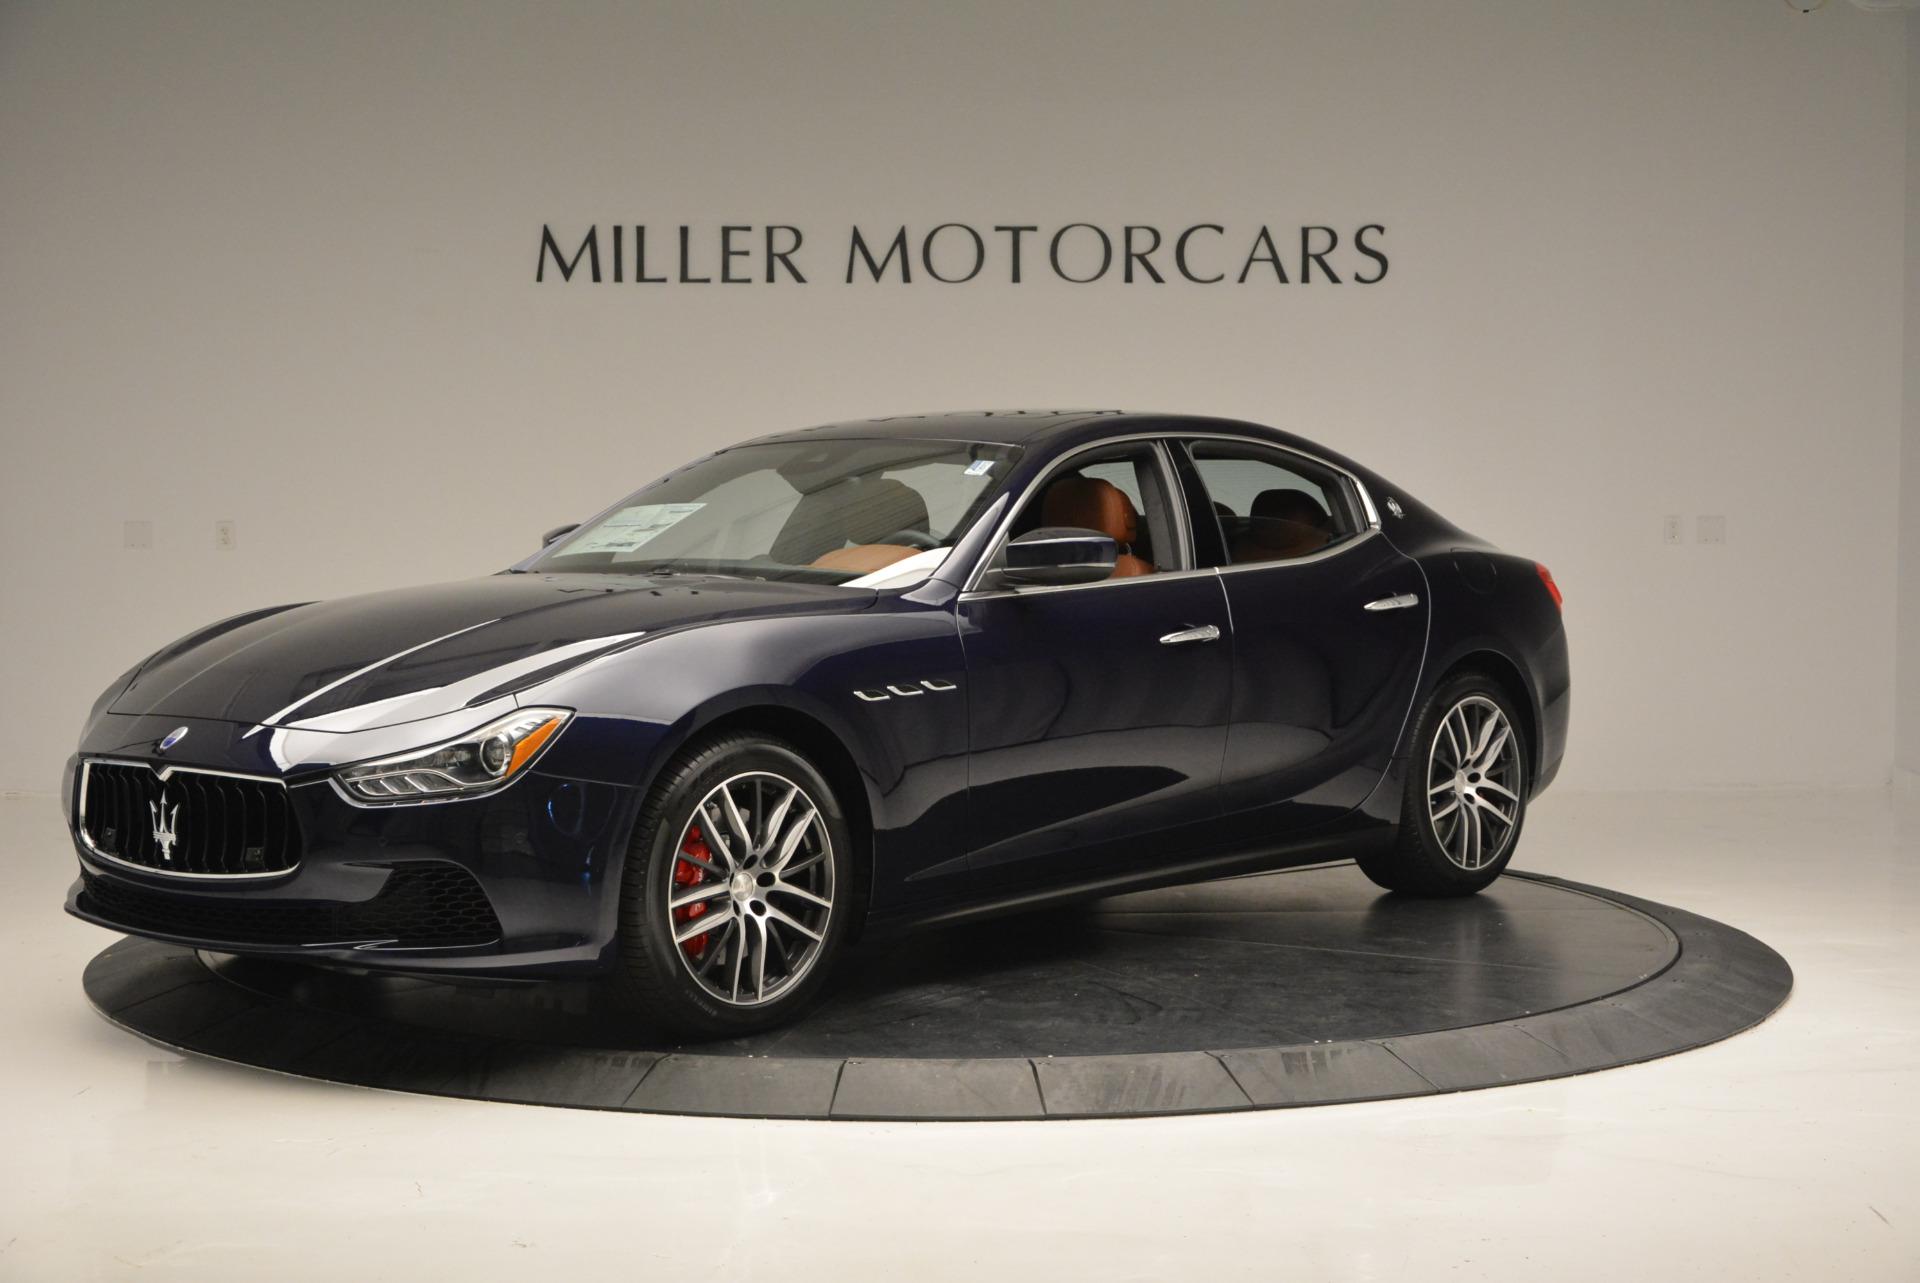 Used 2017 Maserati Ghibli S Q4 - EX Loaner For Sale In Greenwich, CT 568_p2